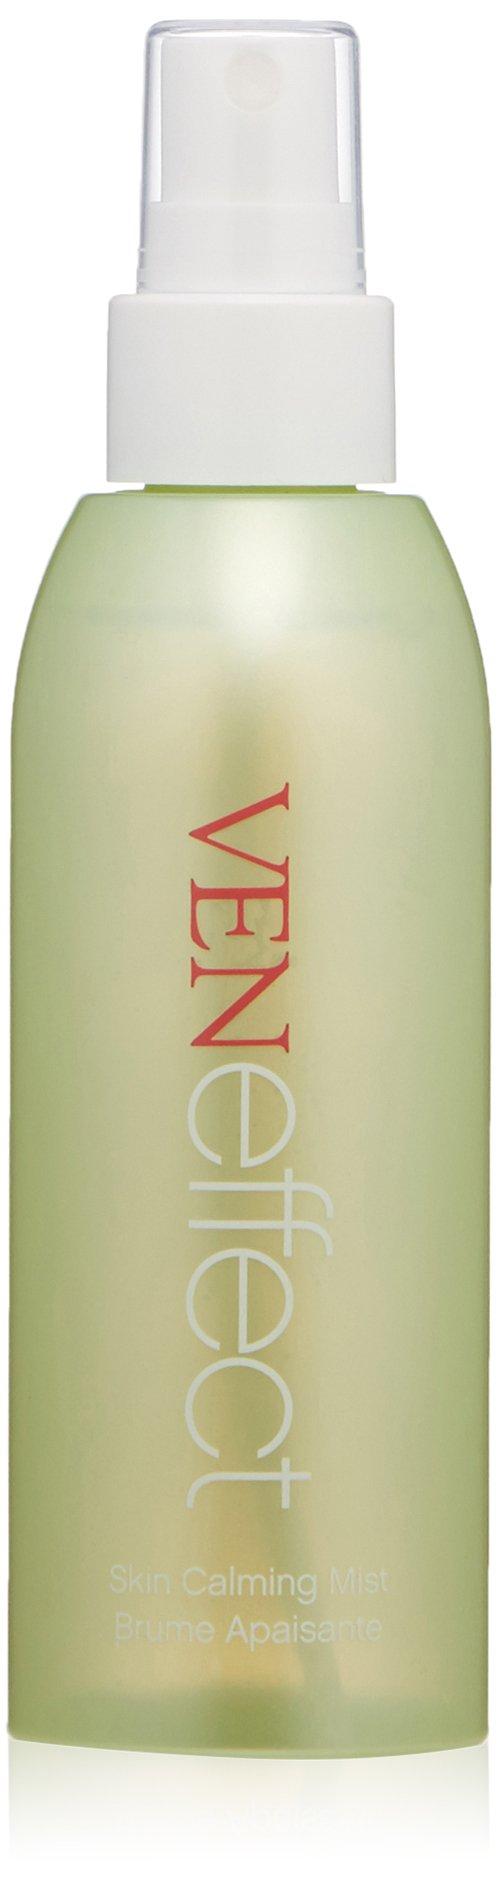 VENeffect Skin Calming Mist, 3.4 fl. oz.